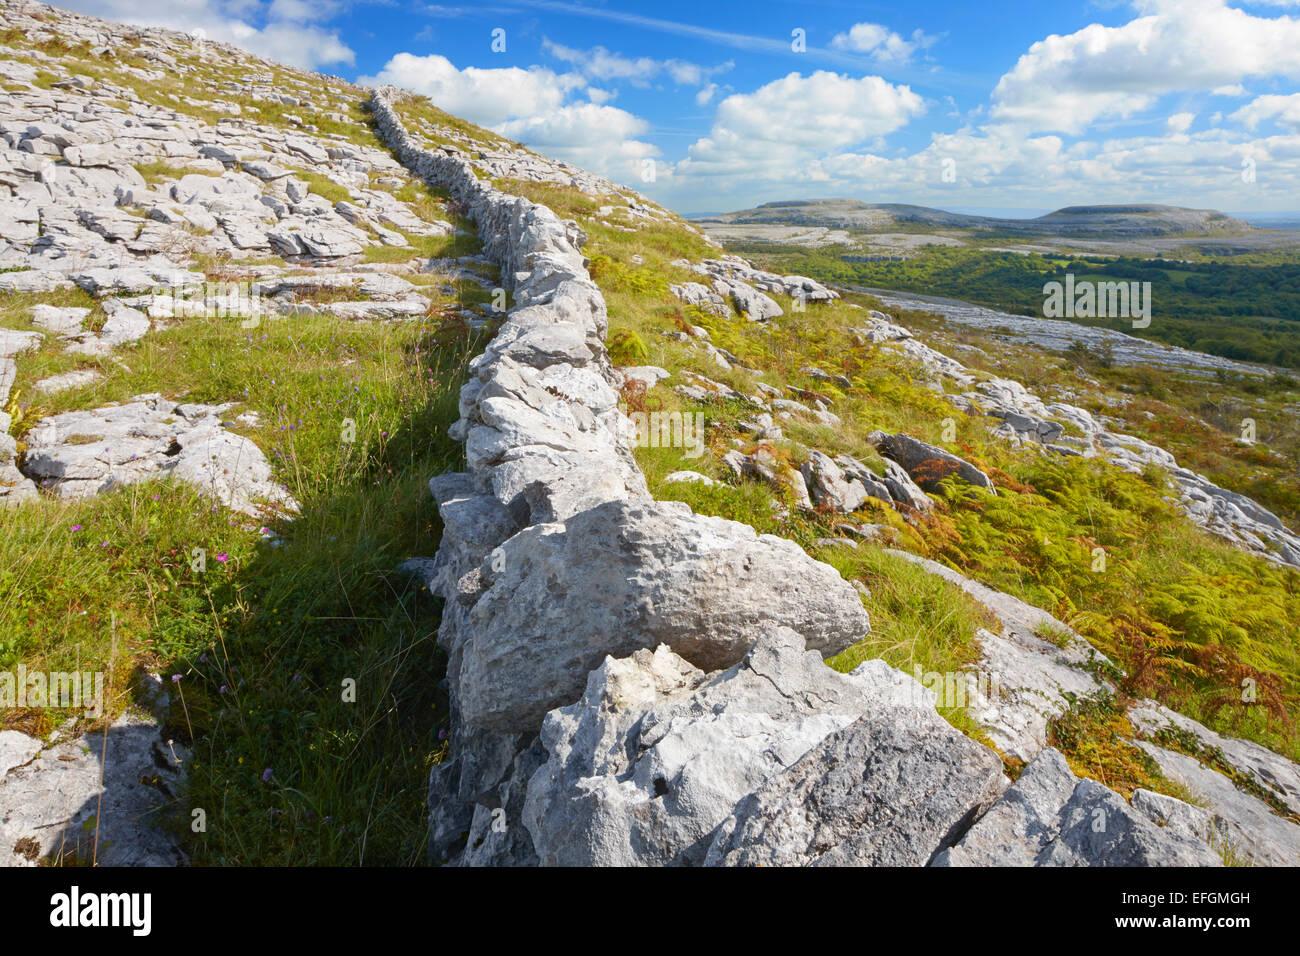 The Burren, County Clare, Ireland - Stock Image